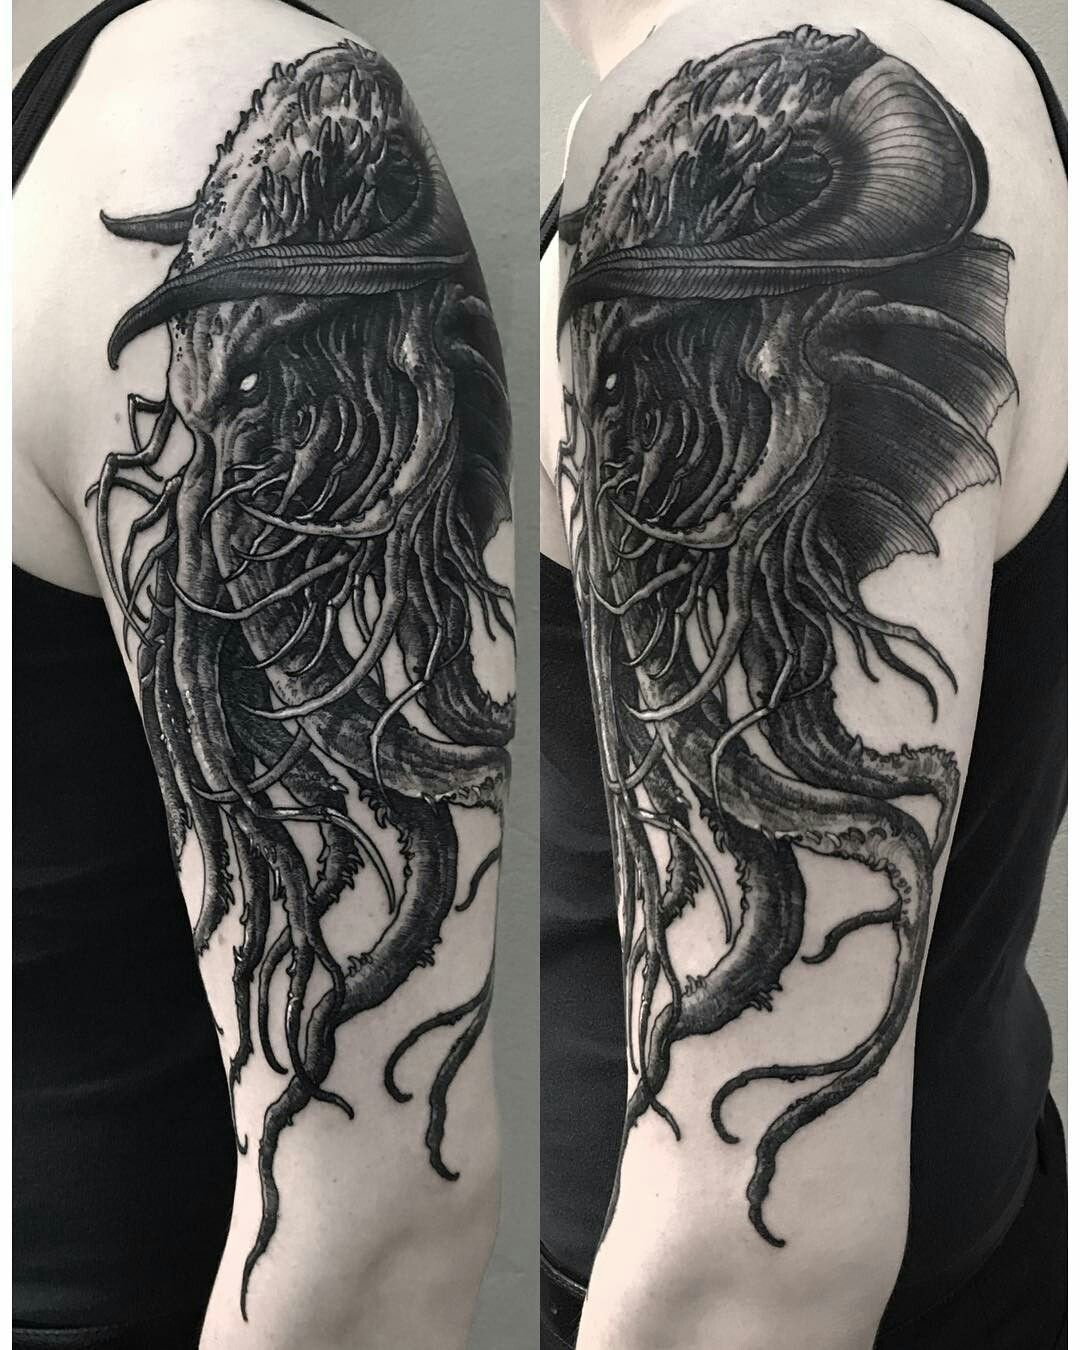 Cthulhu Tattoo Sleeve : cthulhu, tattoo, sleeve, Cthulhu, _lipa_),, #Cthulhu, #Lipa, #octopustattooarmkraken, Tattoo,, Kraken, Octopus, Tattoo, Sleeve